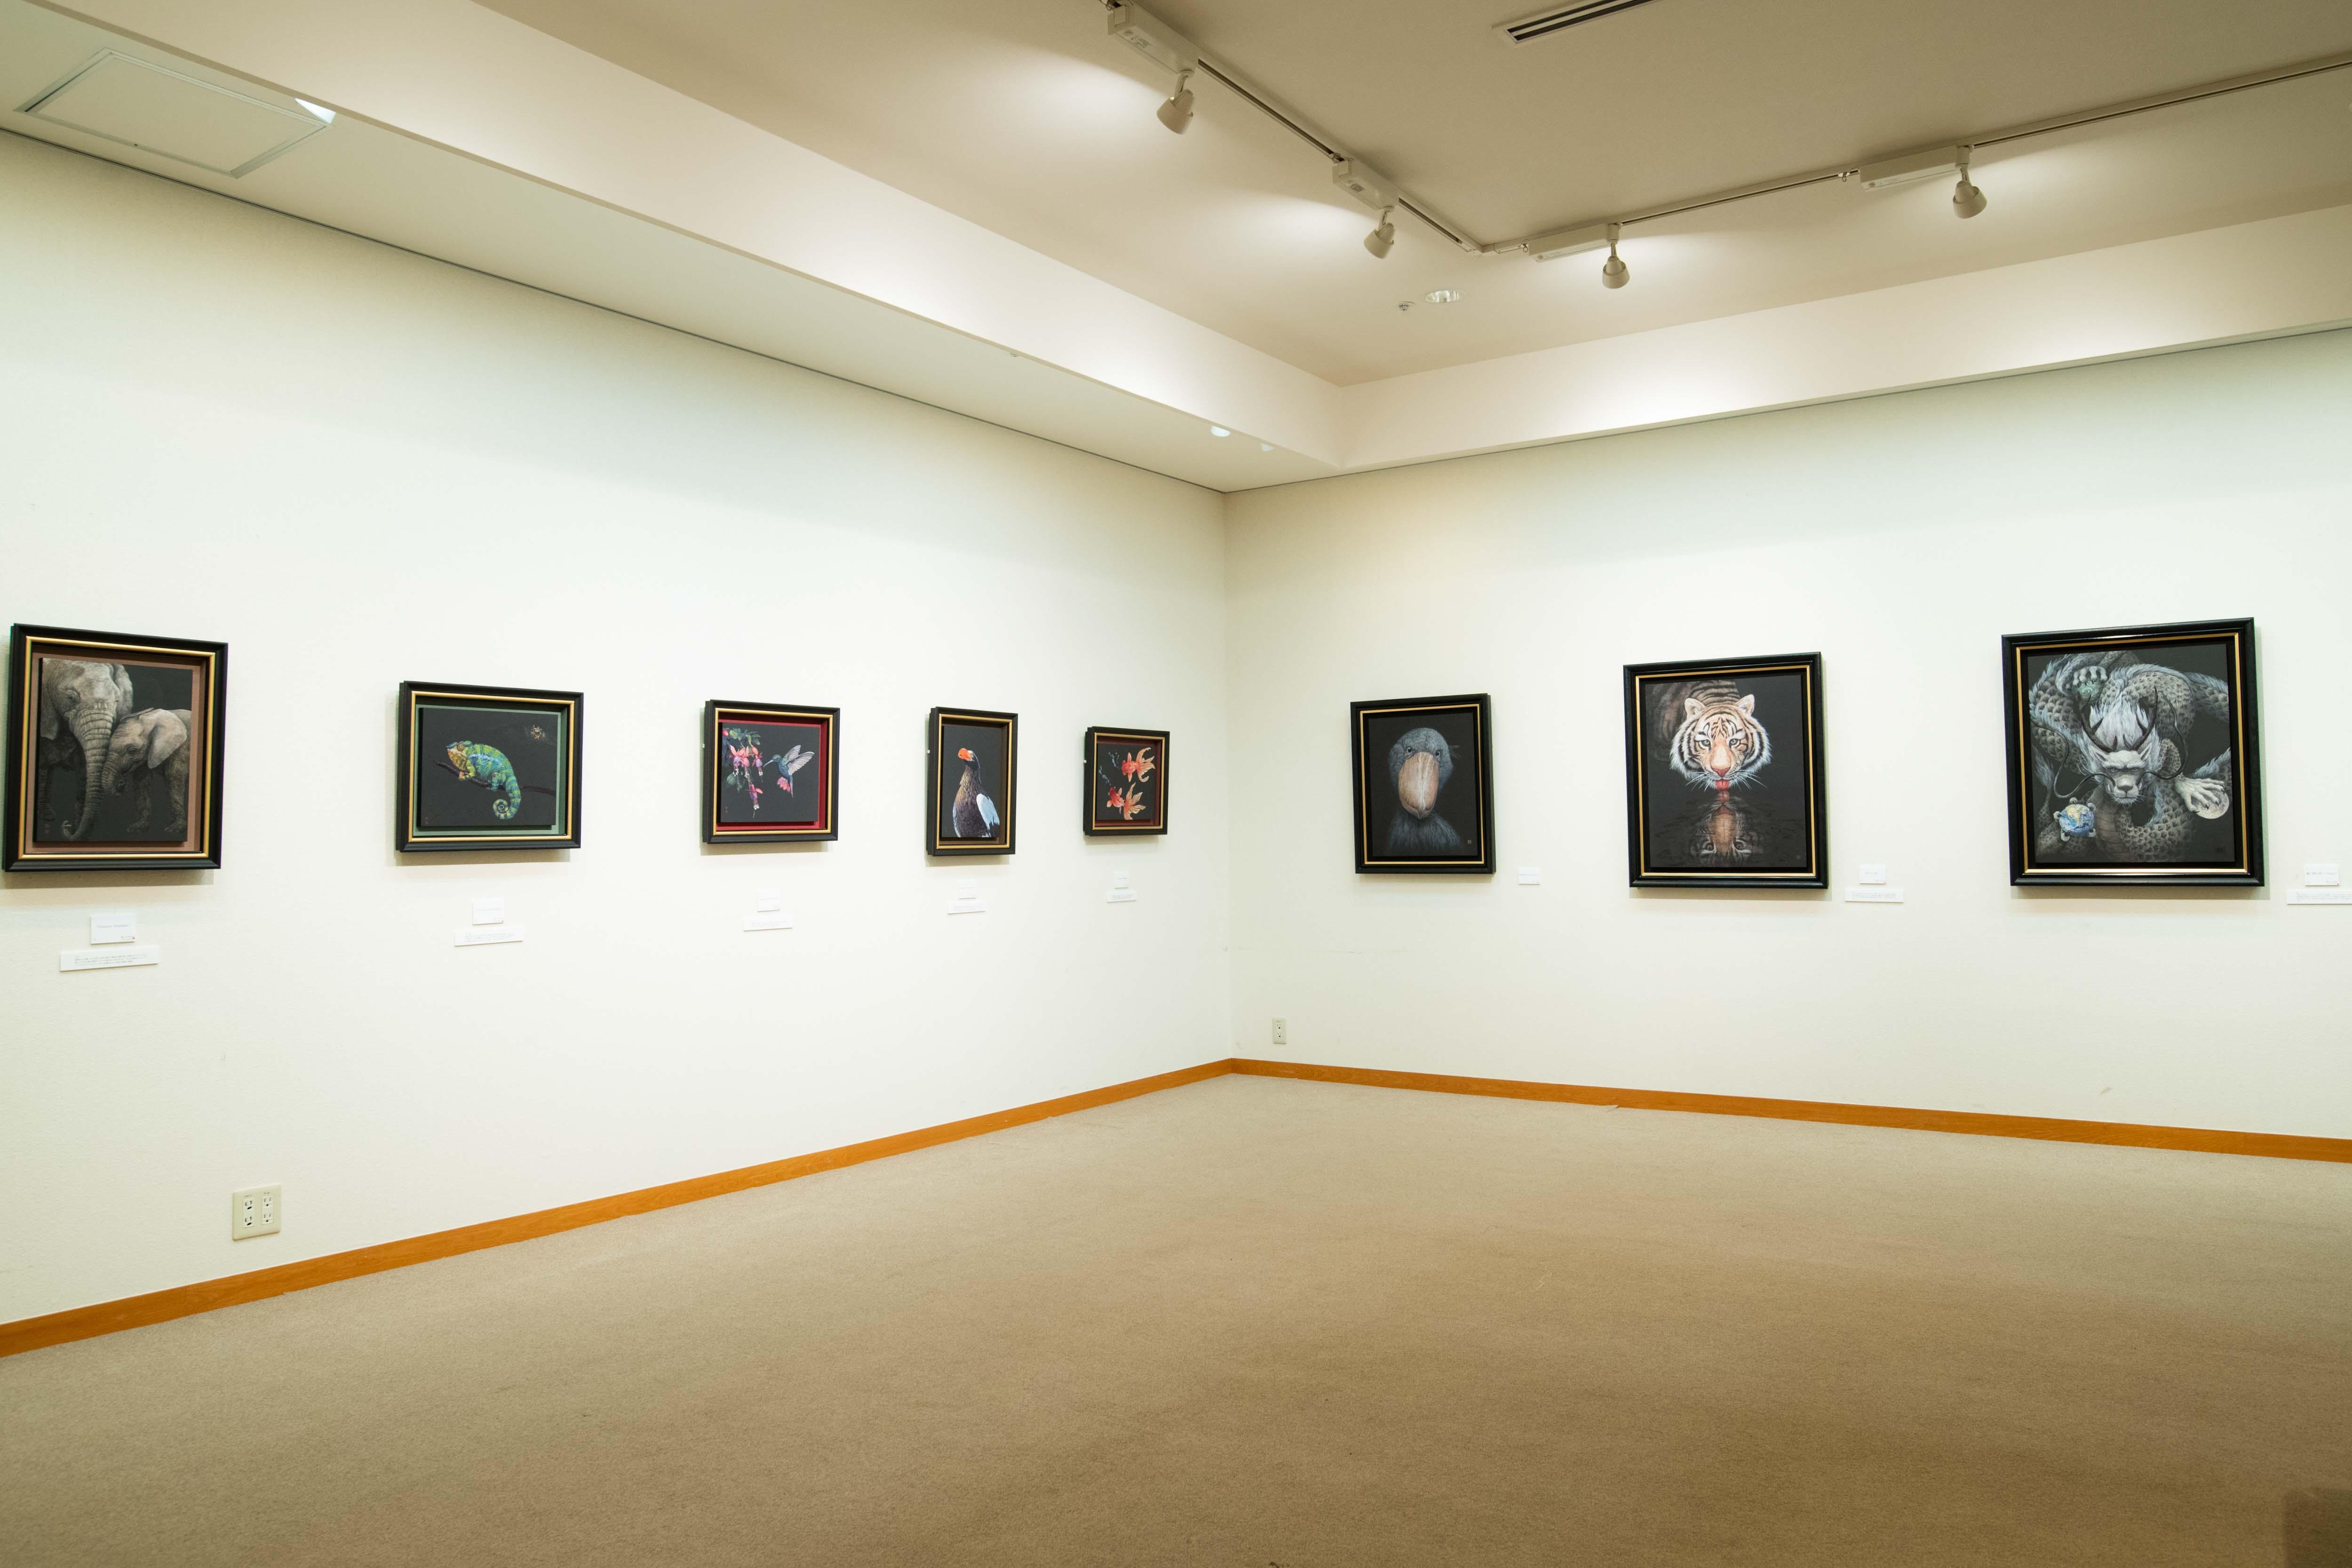 https://kanakokinutani.com/exhibition/image/S20201007-037.jpg